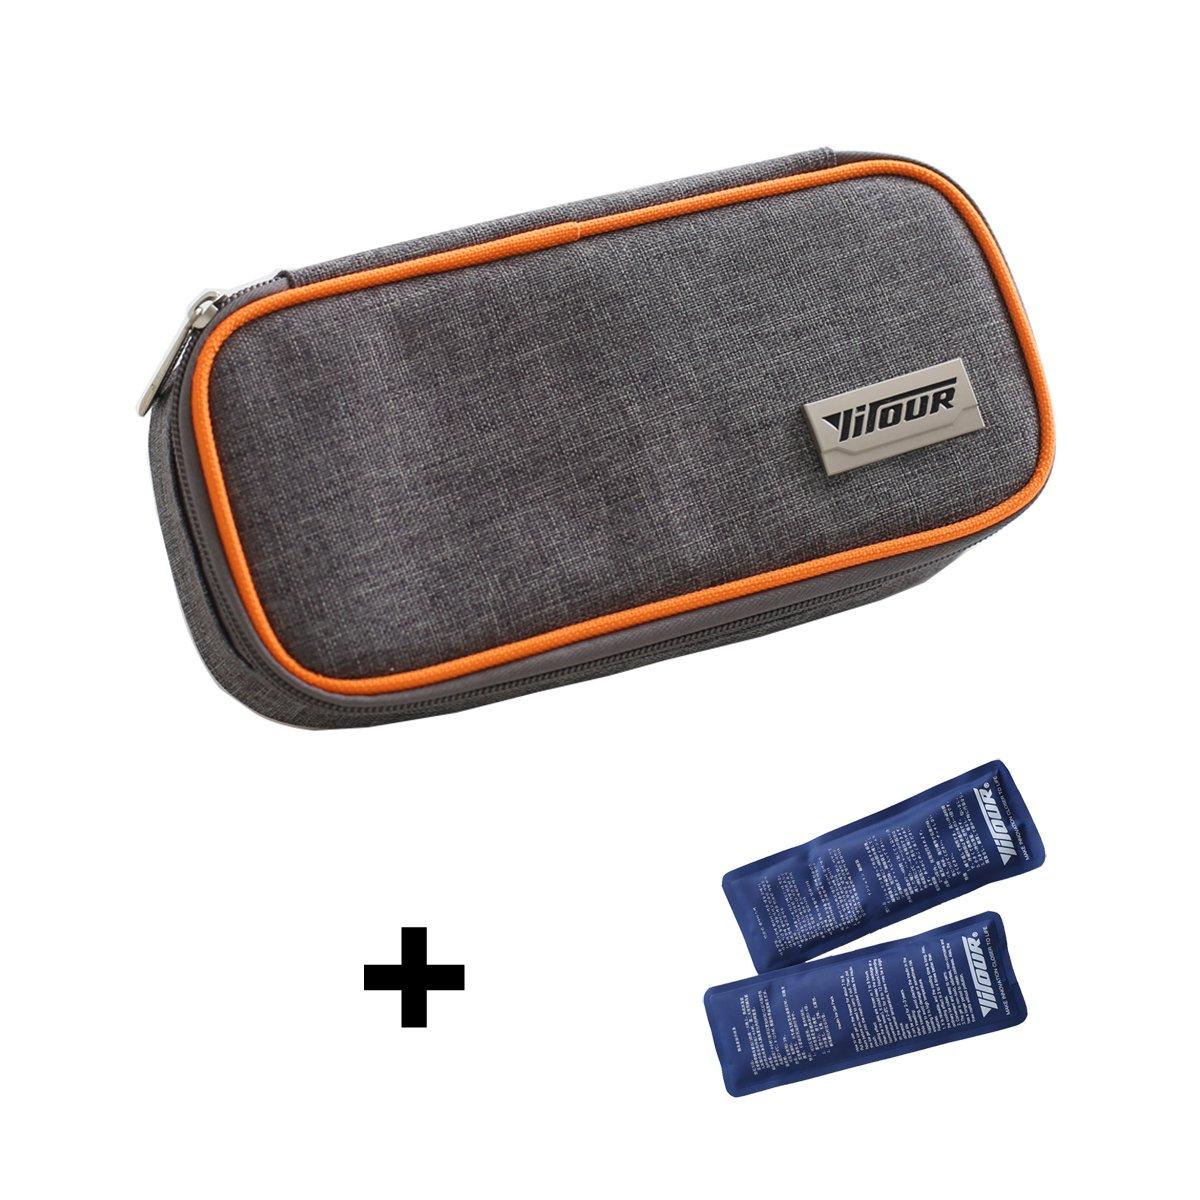 Portable Insulin Cooler Bag Diabetic Care Organizer Travel Medical Pack + 2 Ice Gel Packs (Orange)